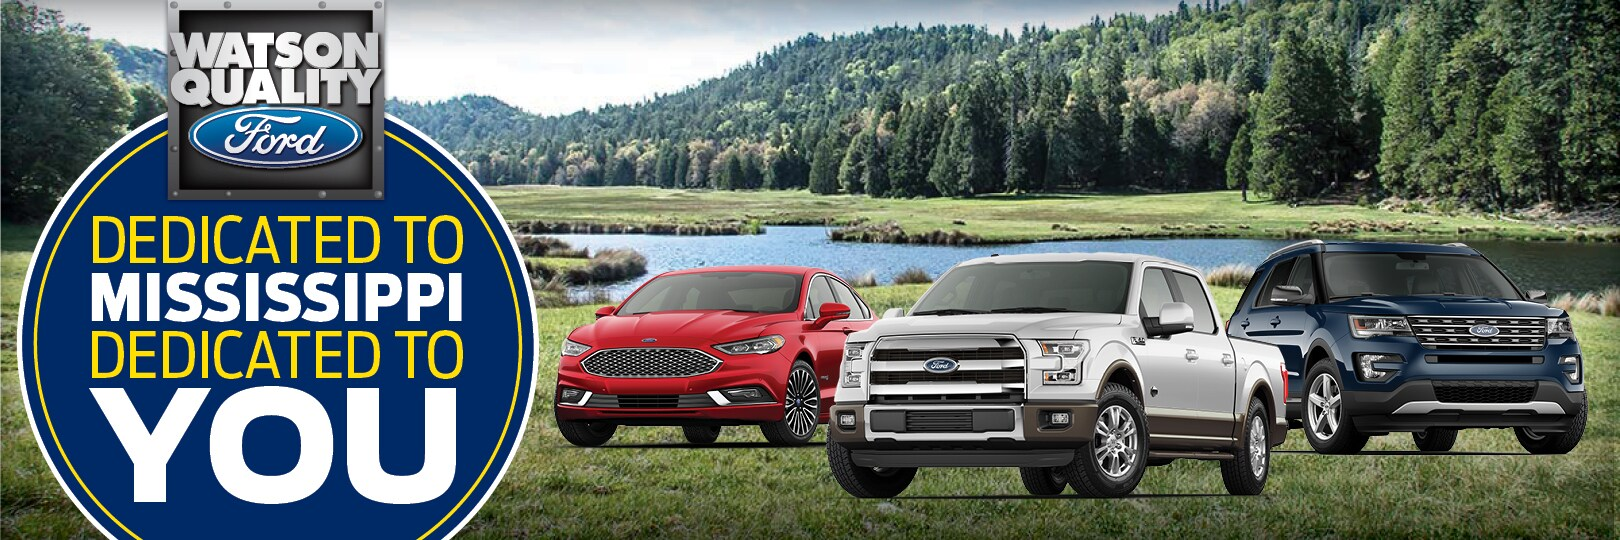 Previous Next. Auto Inventory Auto Inventory & Jackson Watson Quality Ford Inc. | New u0026 Used Ford Cars Ridgeland MS markmcfarlin.com